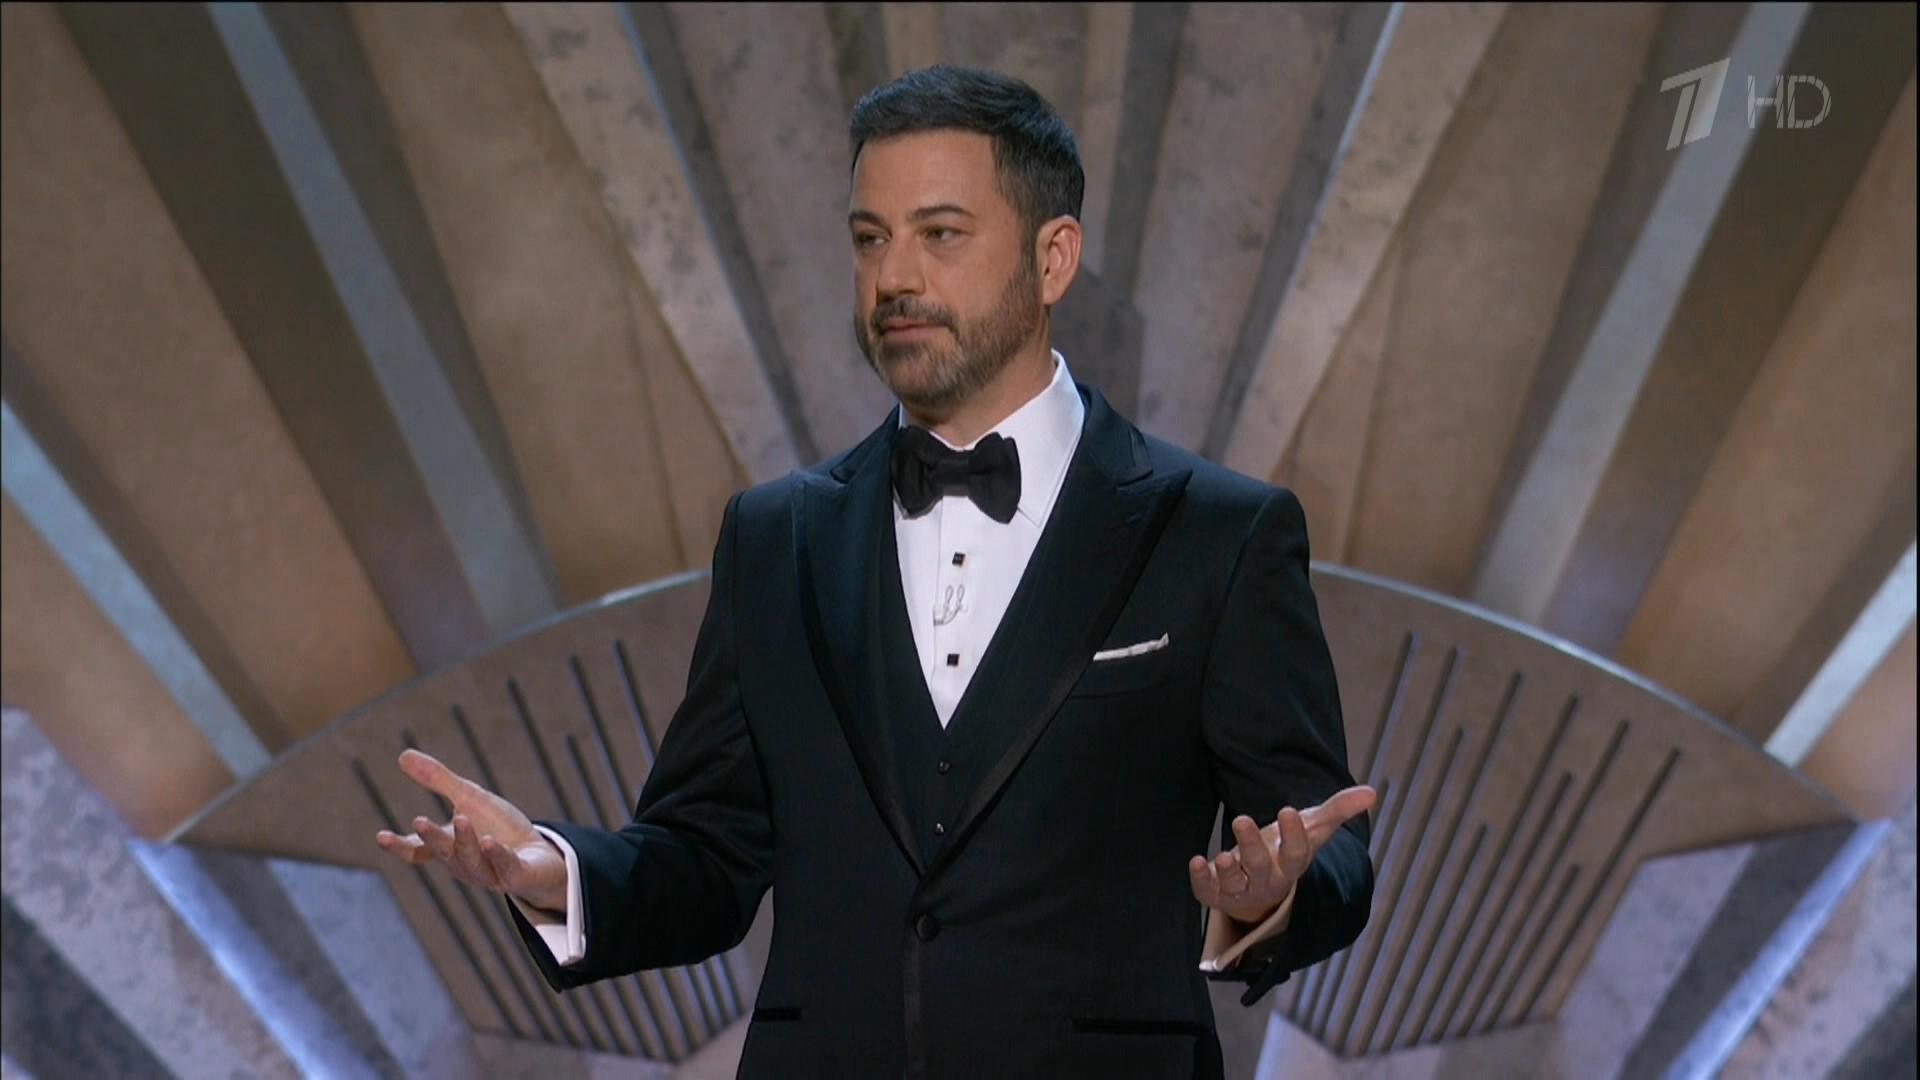 90-я церемония вручения премии «Оскар» 2018 / The 90th Annual Academy Awards [04.03] (2018) HDTV 1080i